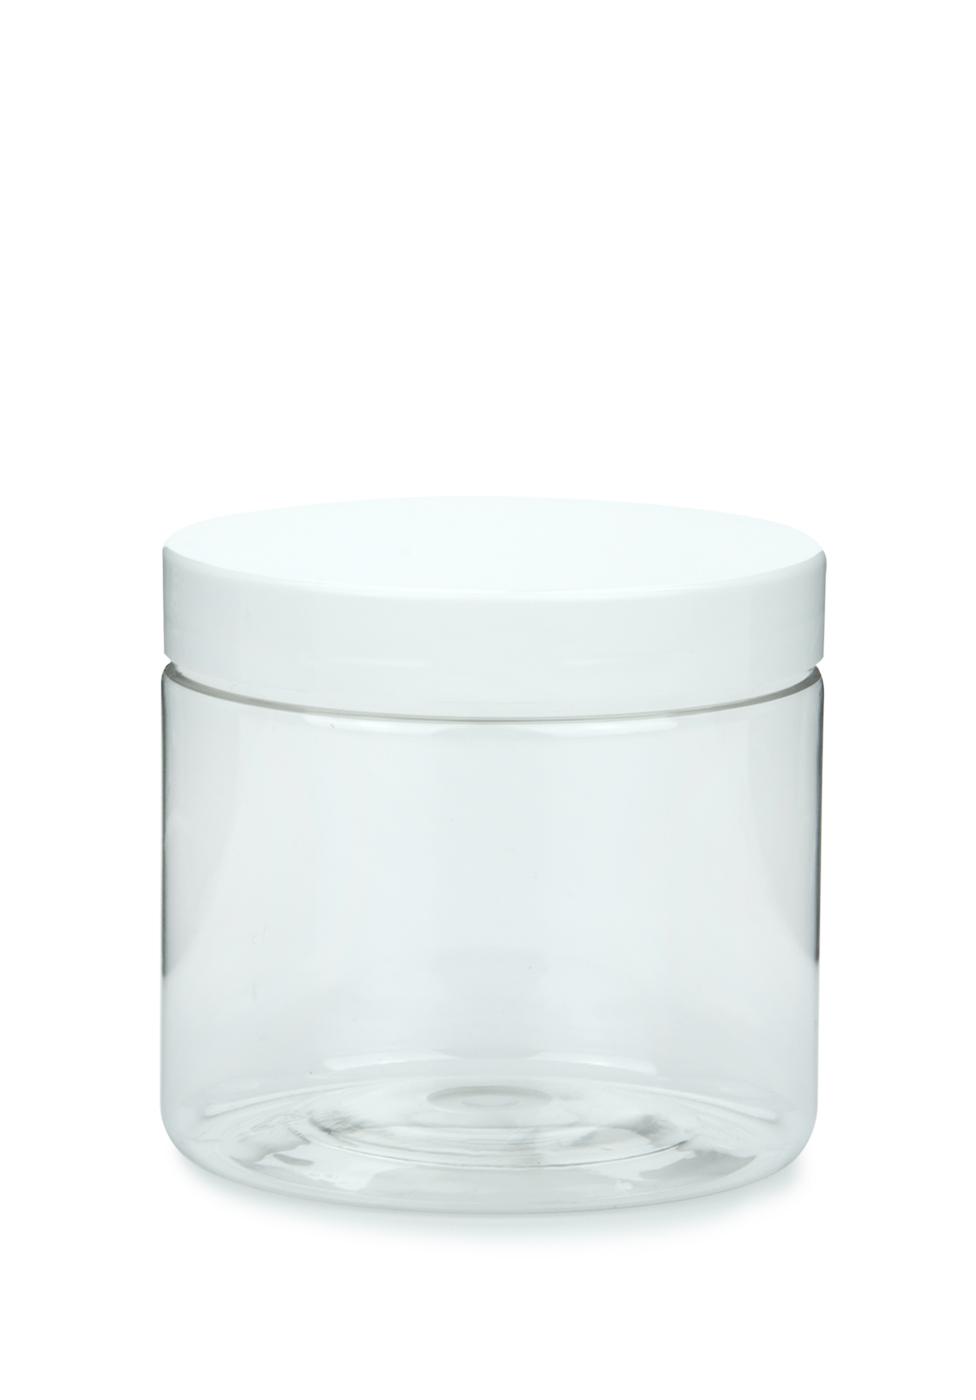 pet tiegel cylindrical klar 200 ml mit kunststoff schraubdeckel wei 70 mm. Black Bedroom Furniture Sets. Home Design Ideas